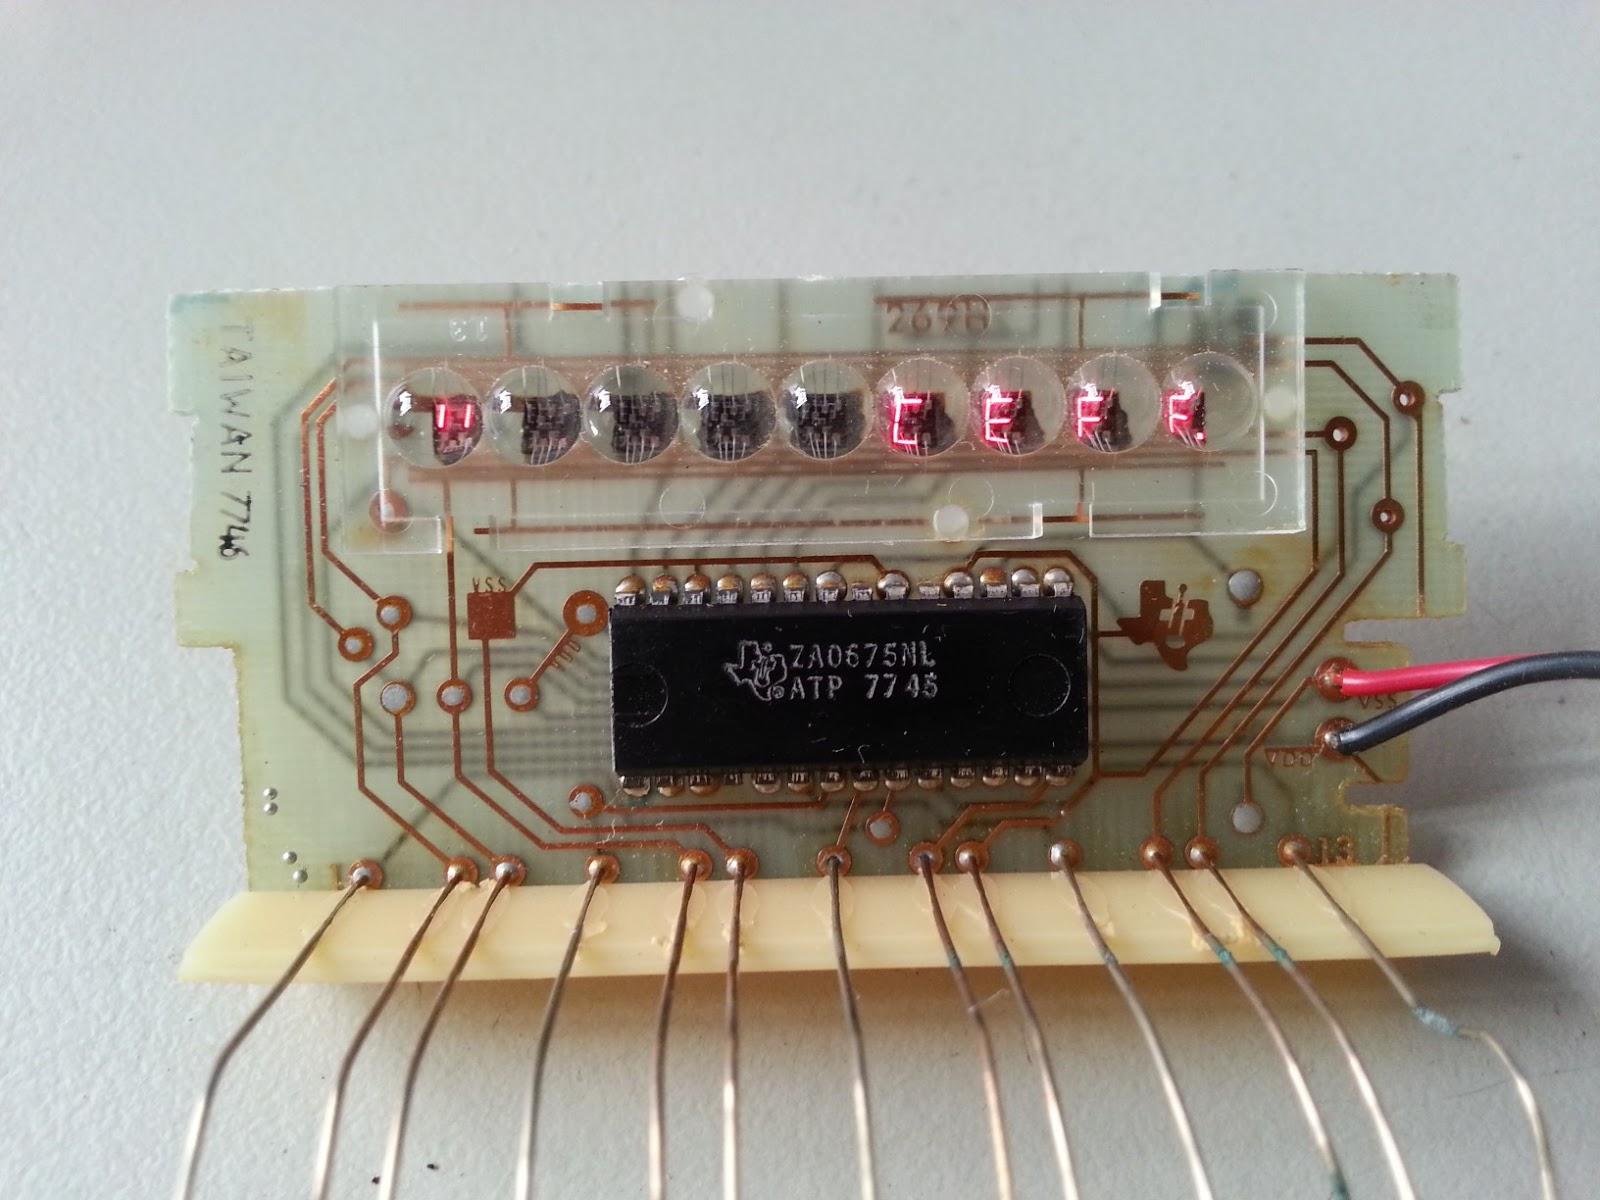 LC64 -a modular PLCC 6502 computer & CBM Stuff: August 2015